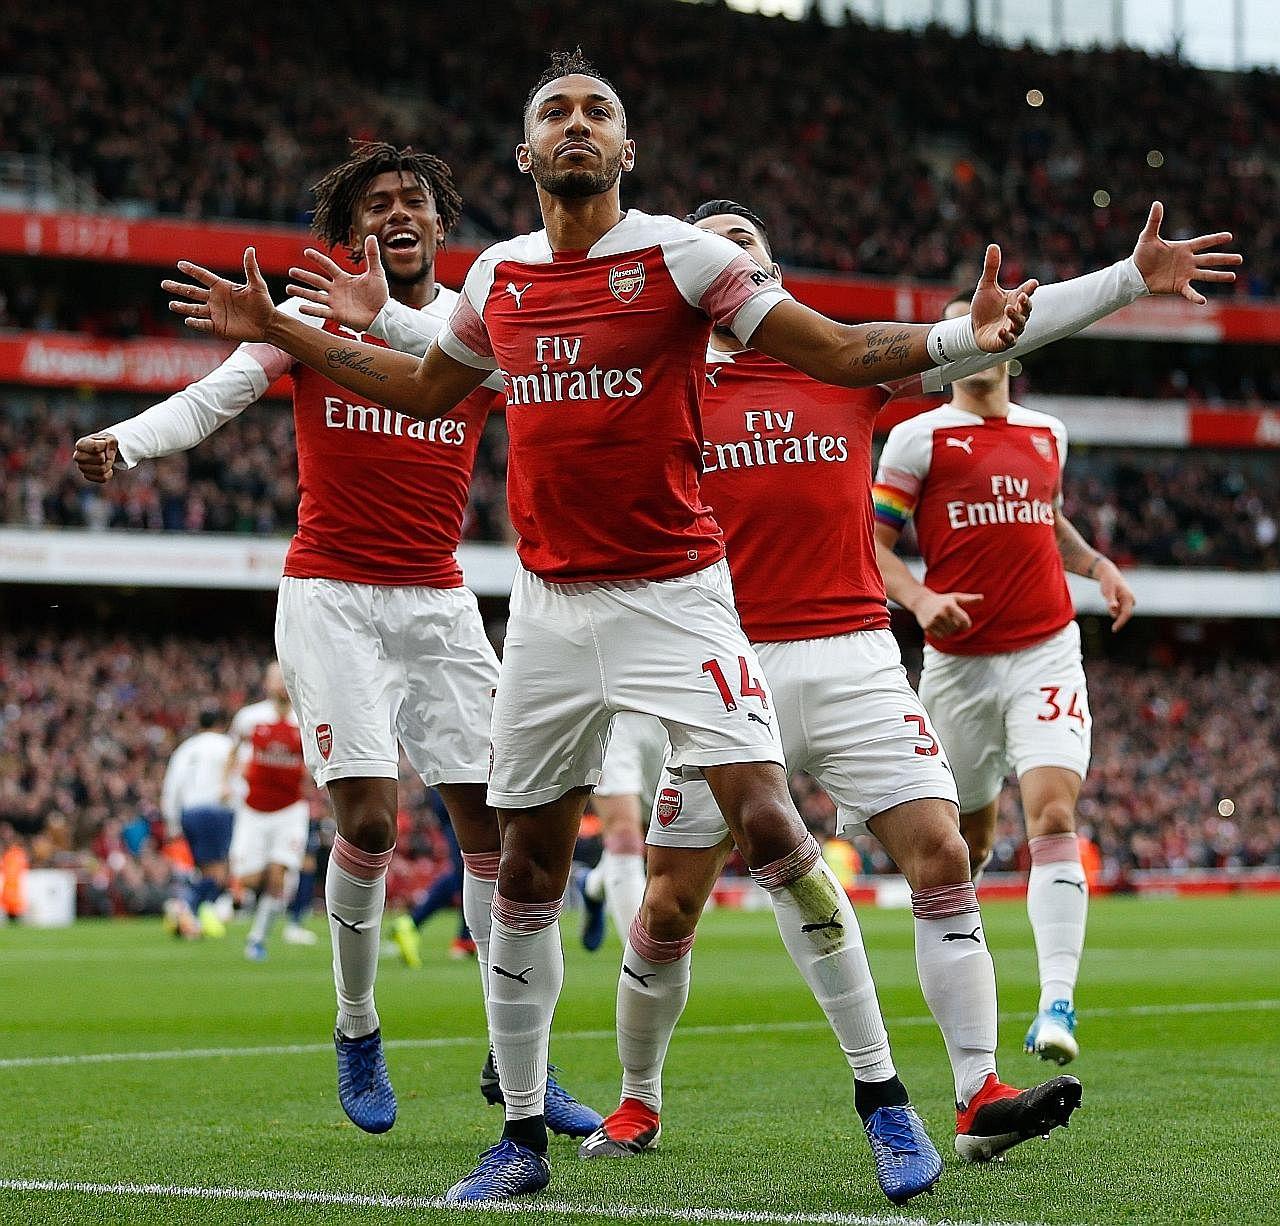 Man U perlu 'keajaiban' bila temu Arsenal